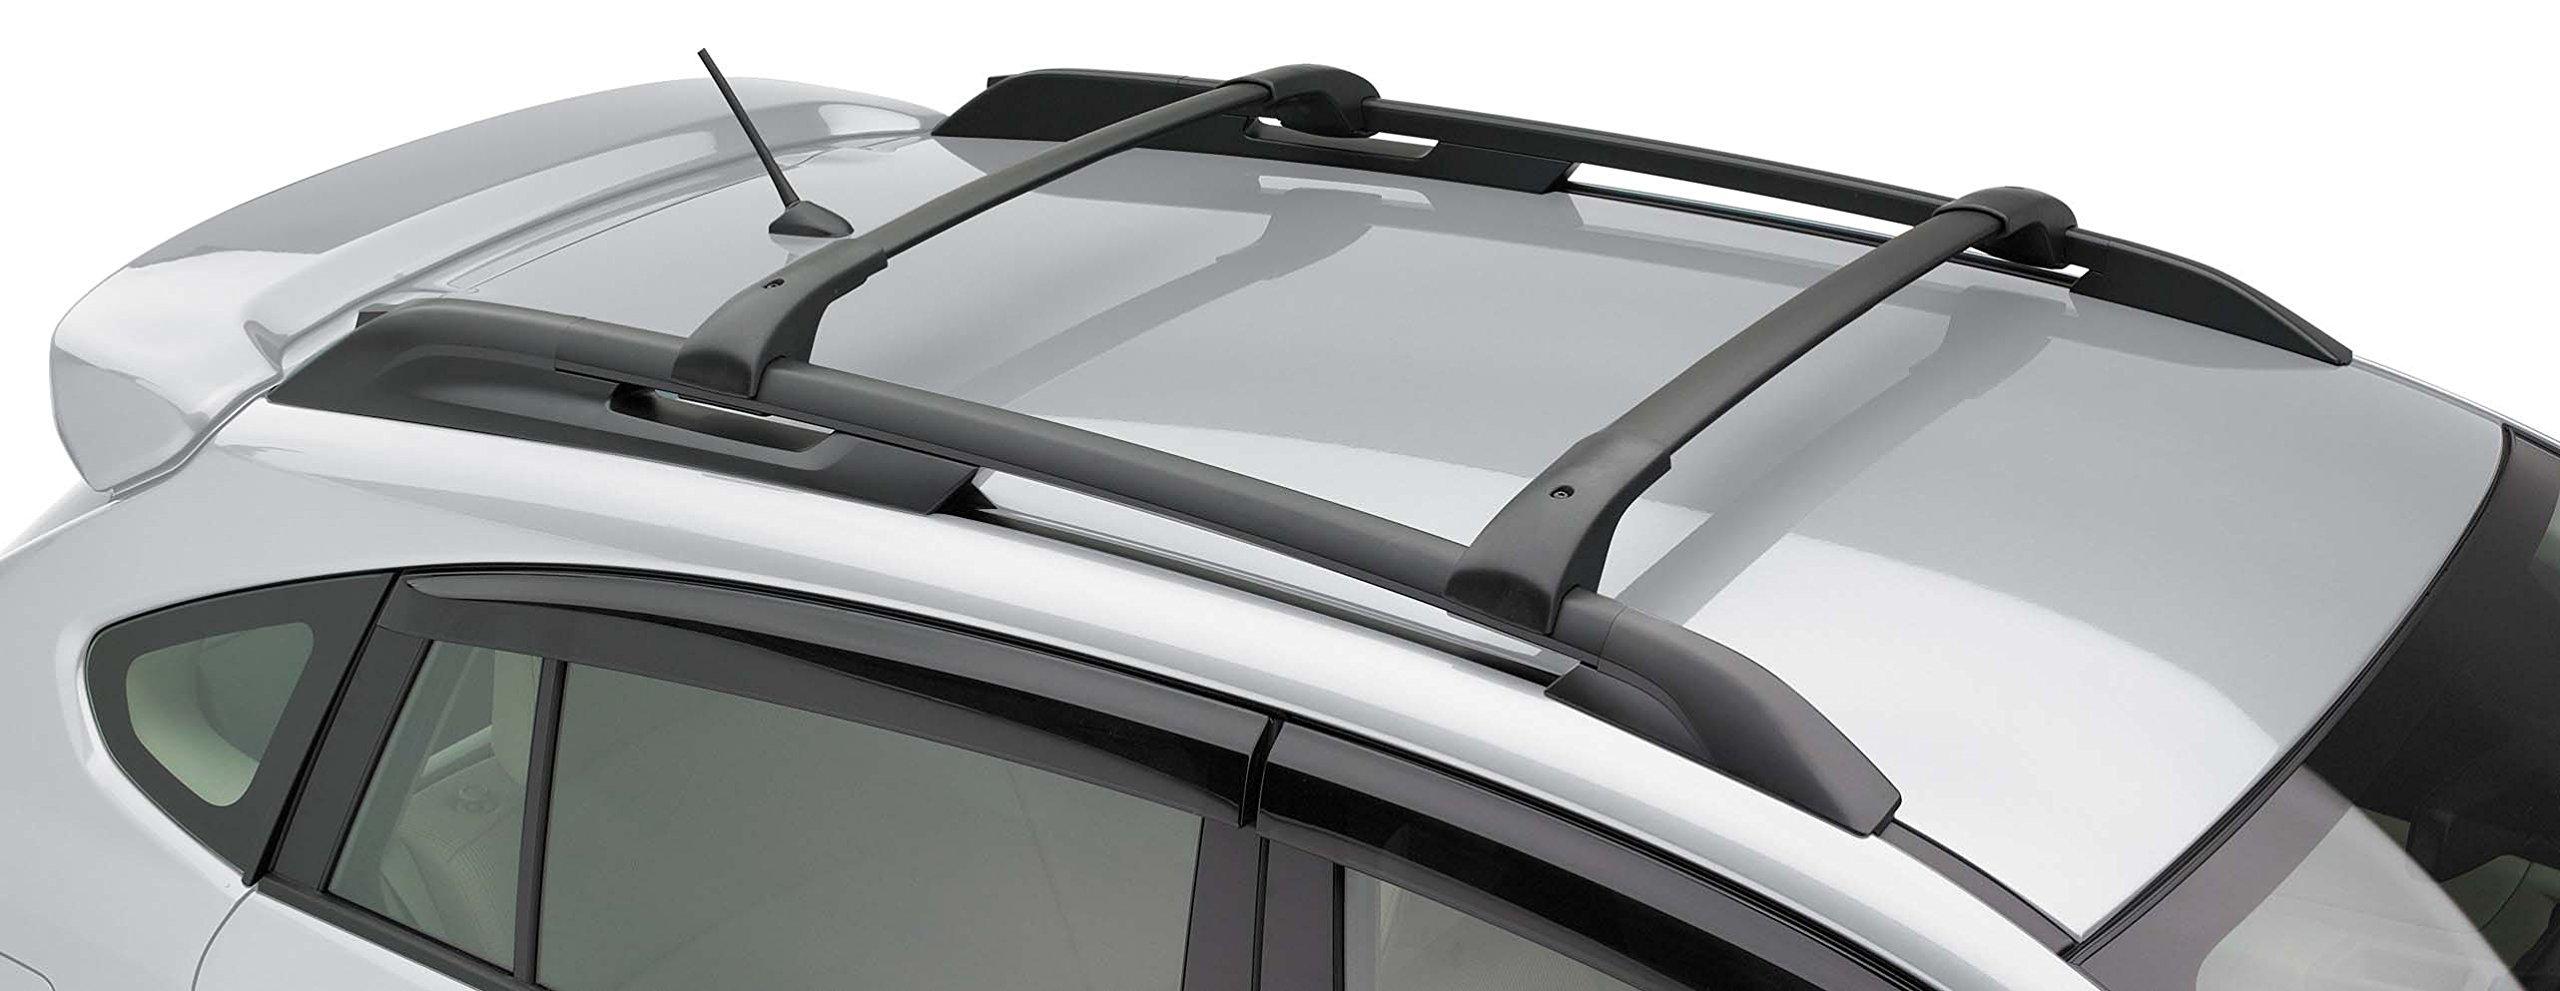 BRIGHTLINES 2013-2017 Subaru Crosstrek & 2012-2016 Impreza Aero Crossbars Roof Racks